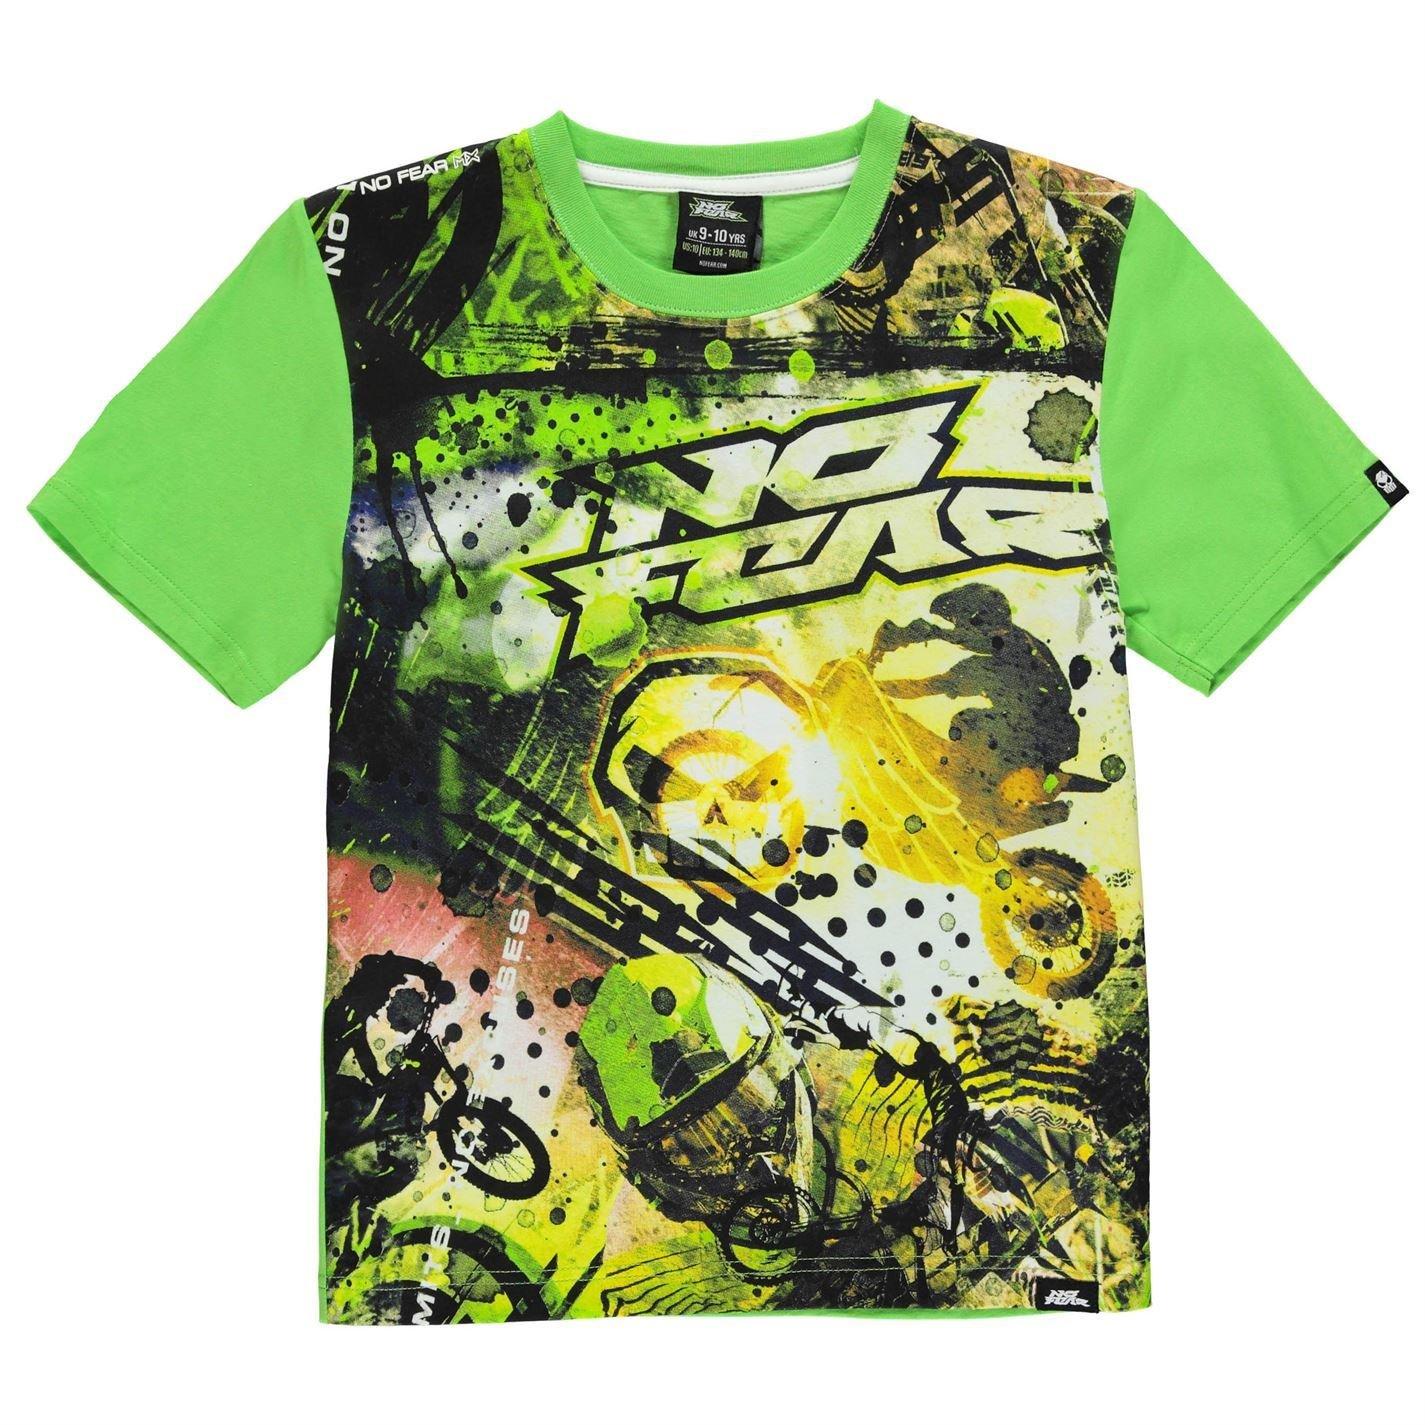 No Fear Niñ os Moto Camiseta Diseñ o Grá fico Manga Corta